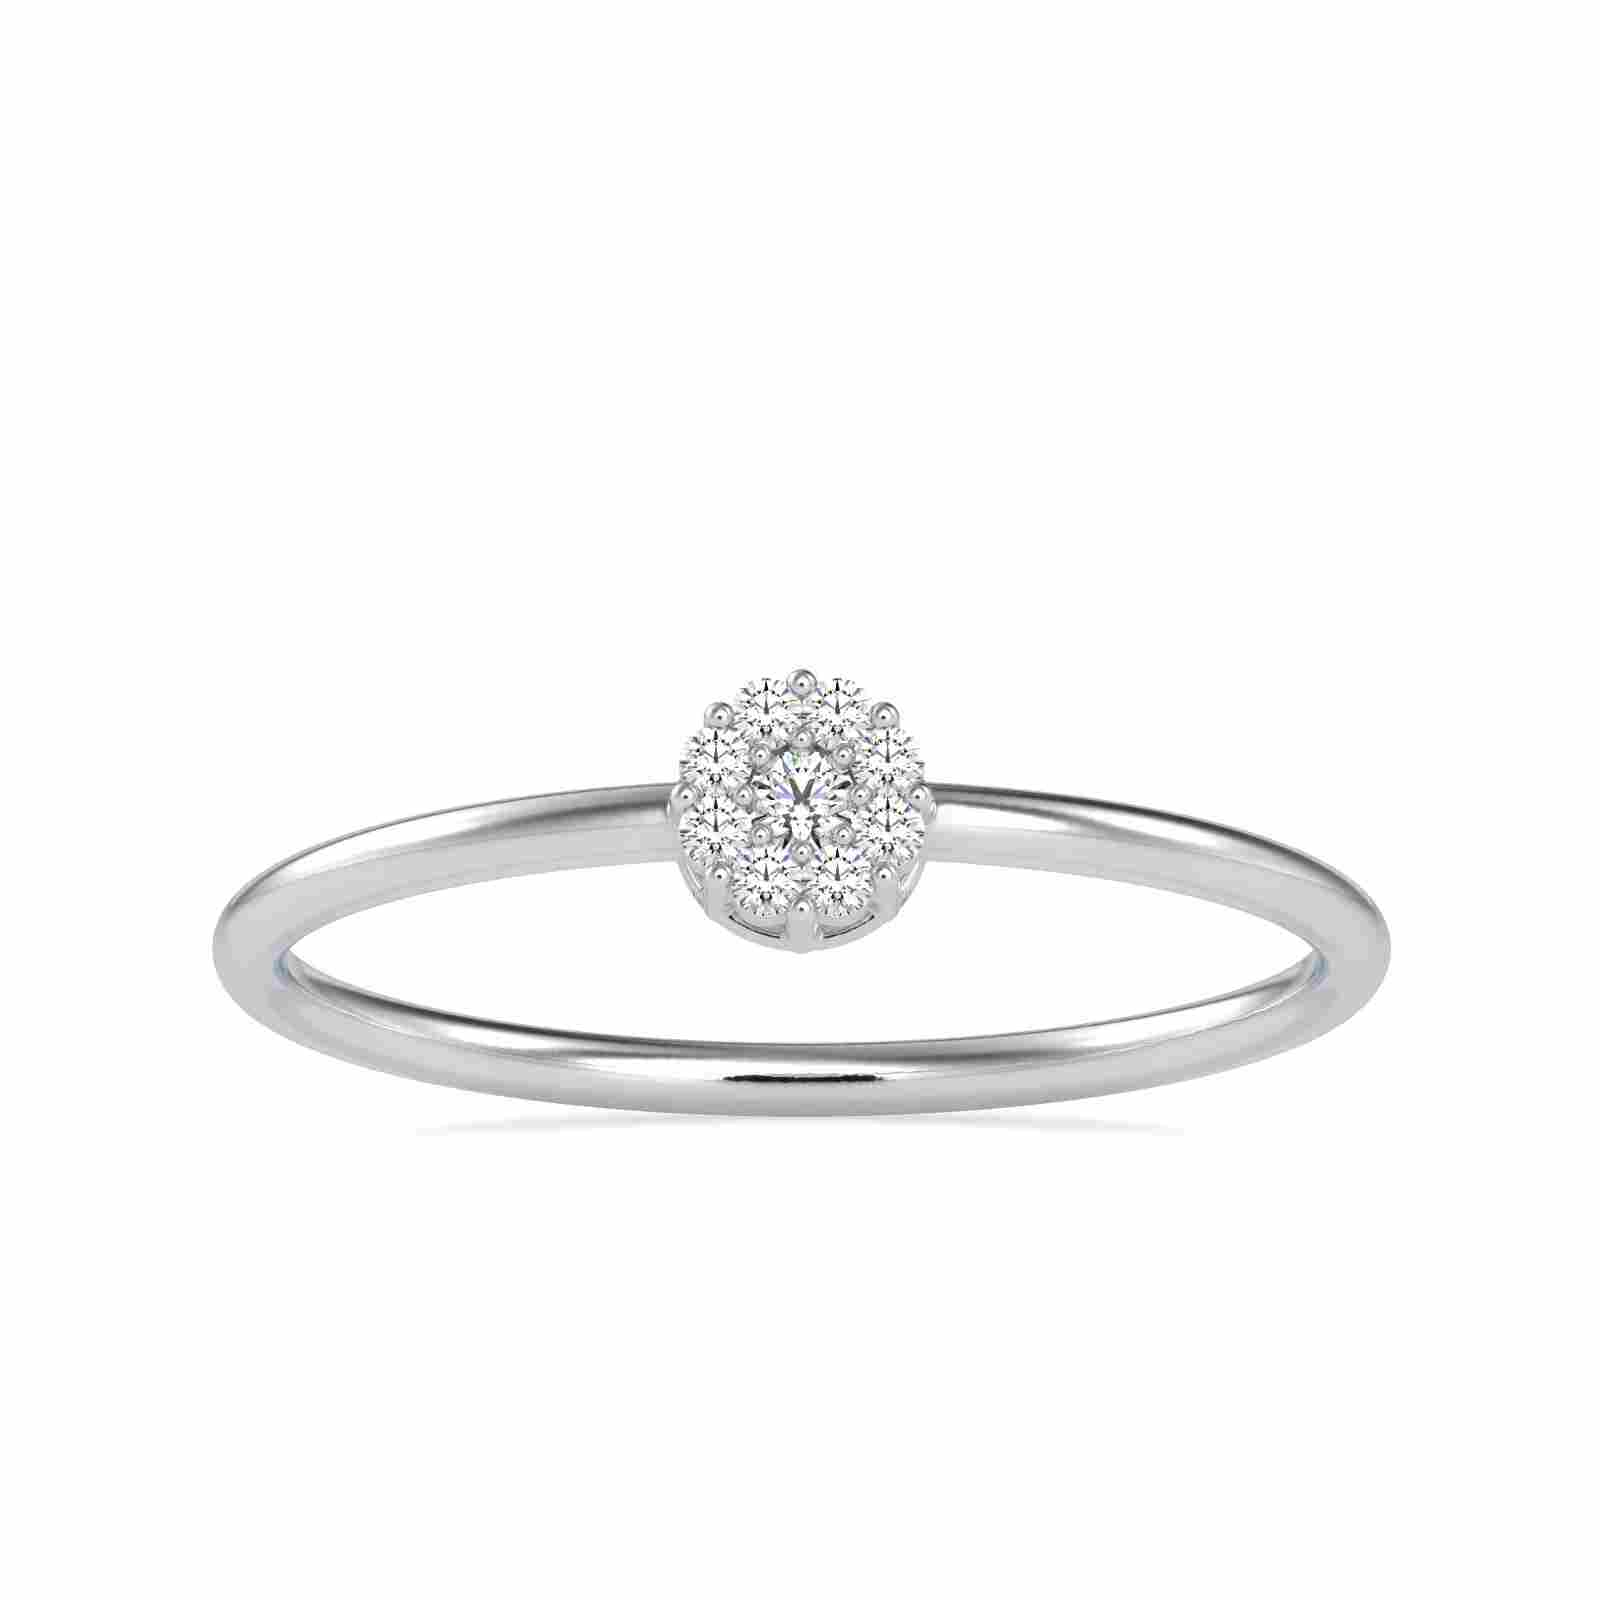 0.07CT Natural Diamond 14K White Gold Ring